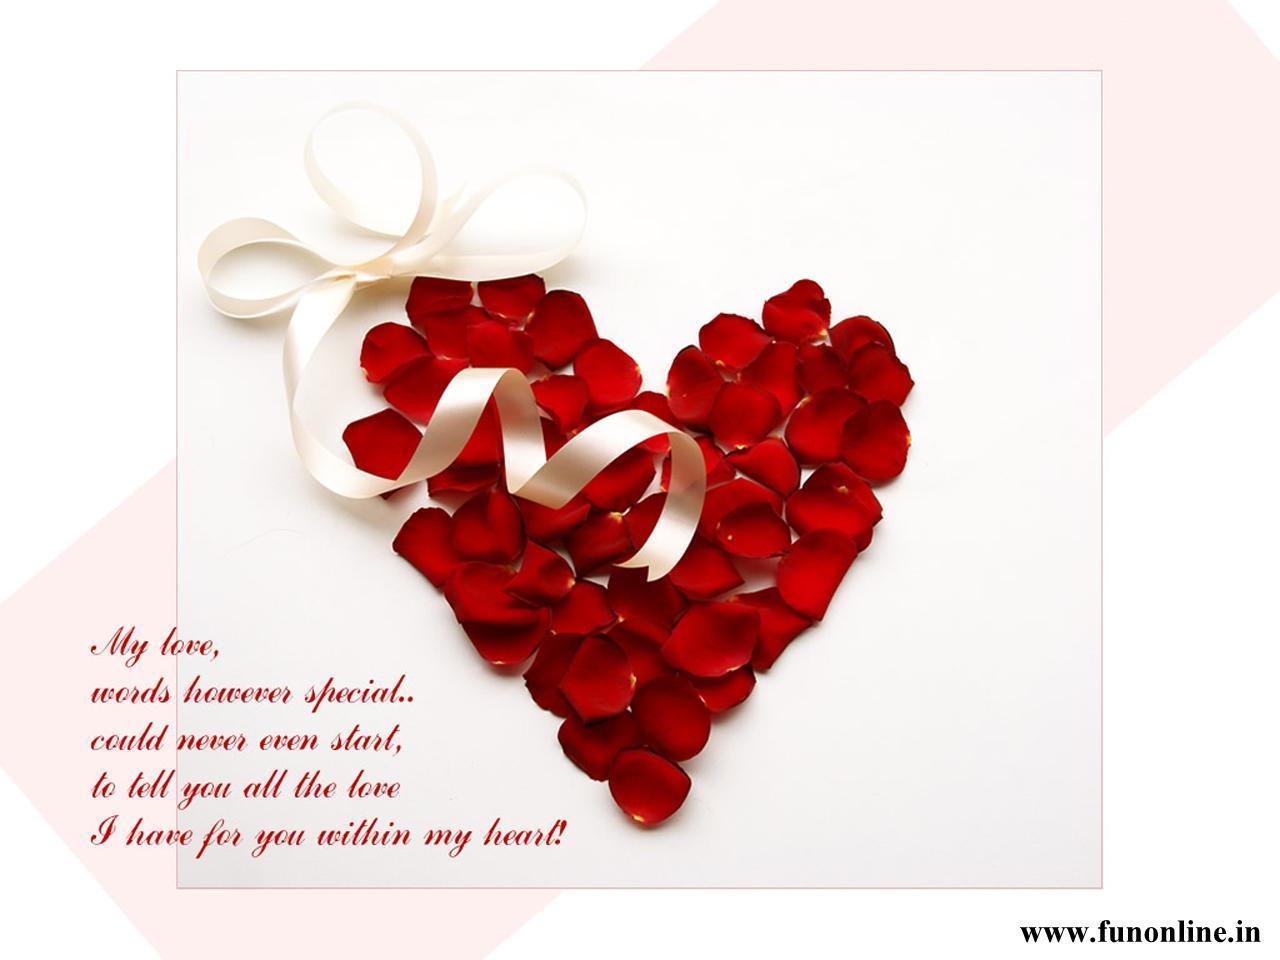 http://4.bp.blogspot.com/-eCu17RJbIuk/UB0s-yRdx6I/AAAAAAAASbY/mI1FbAaOquk/s1600/love+words+wallpaper+%25281%2529.jpg